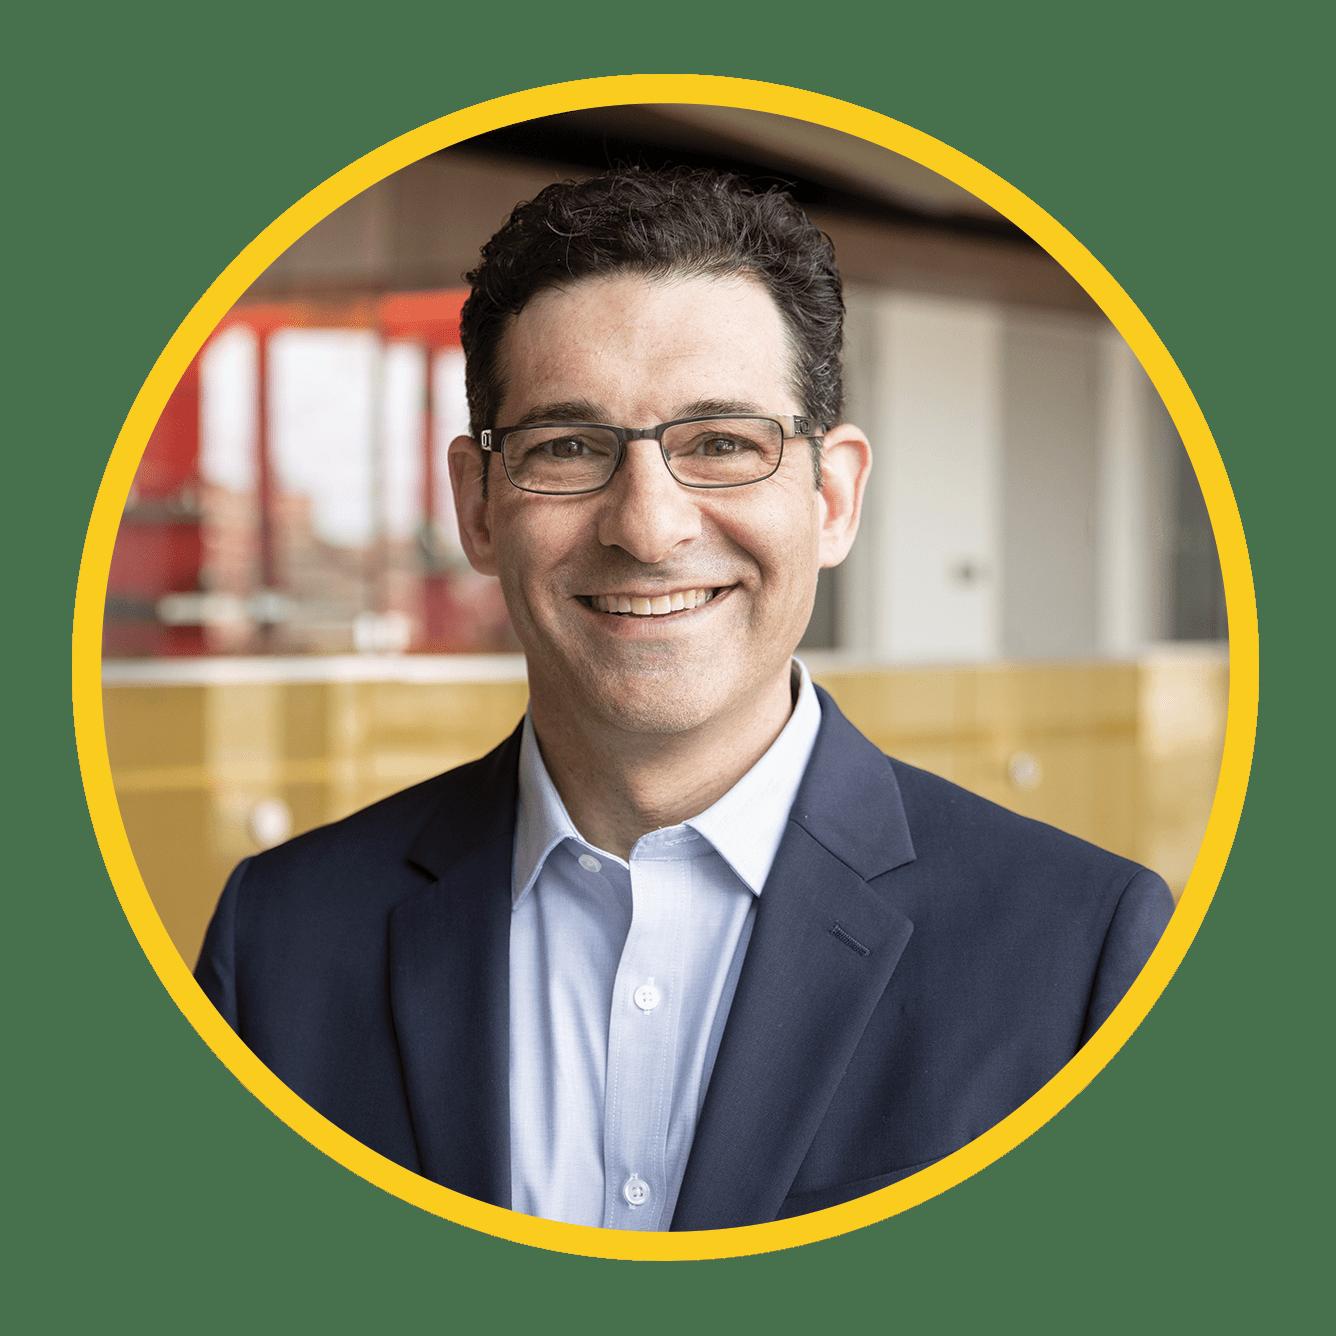 Jon Greene - BUSINESS DEVELOPMENT & COMMERCIALIZATION STRATEGIST